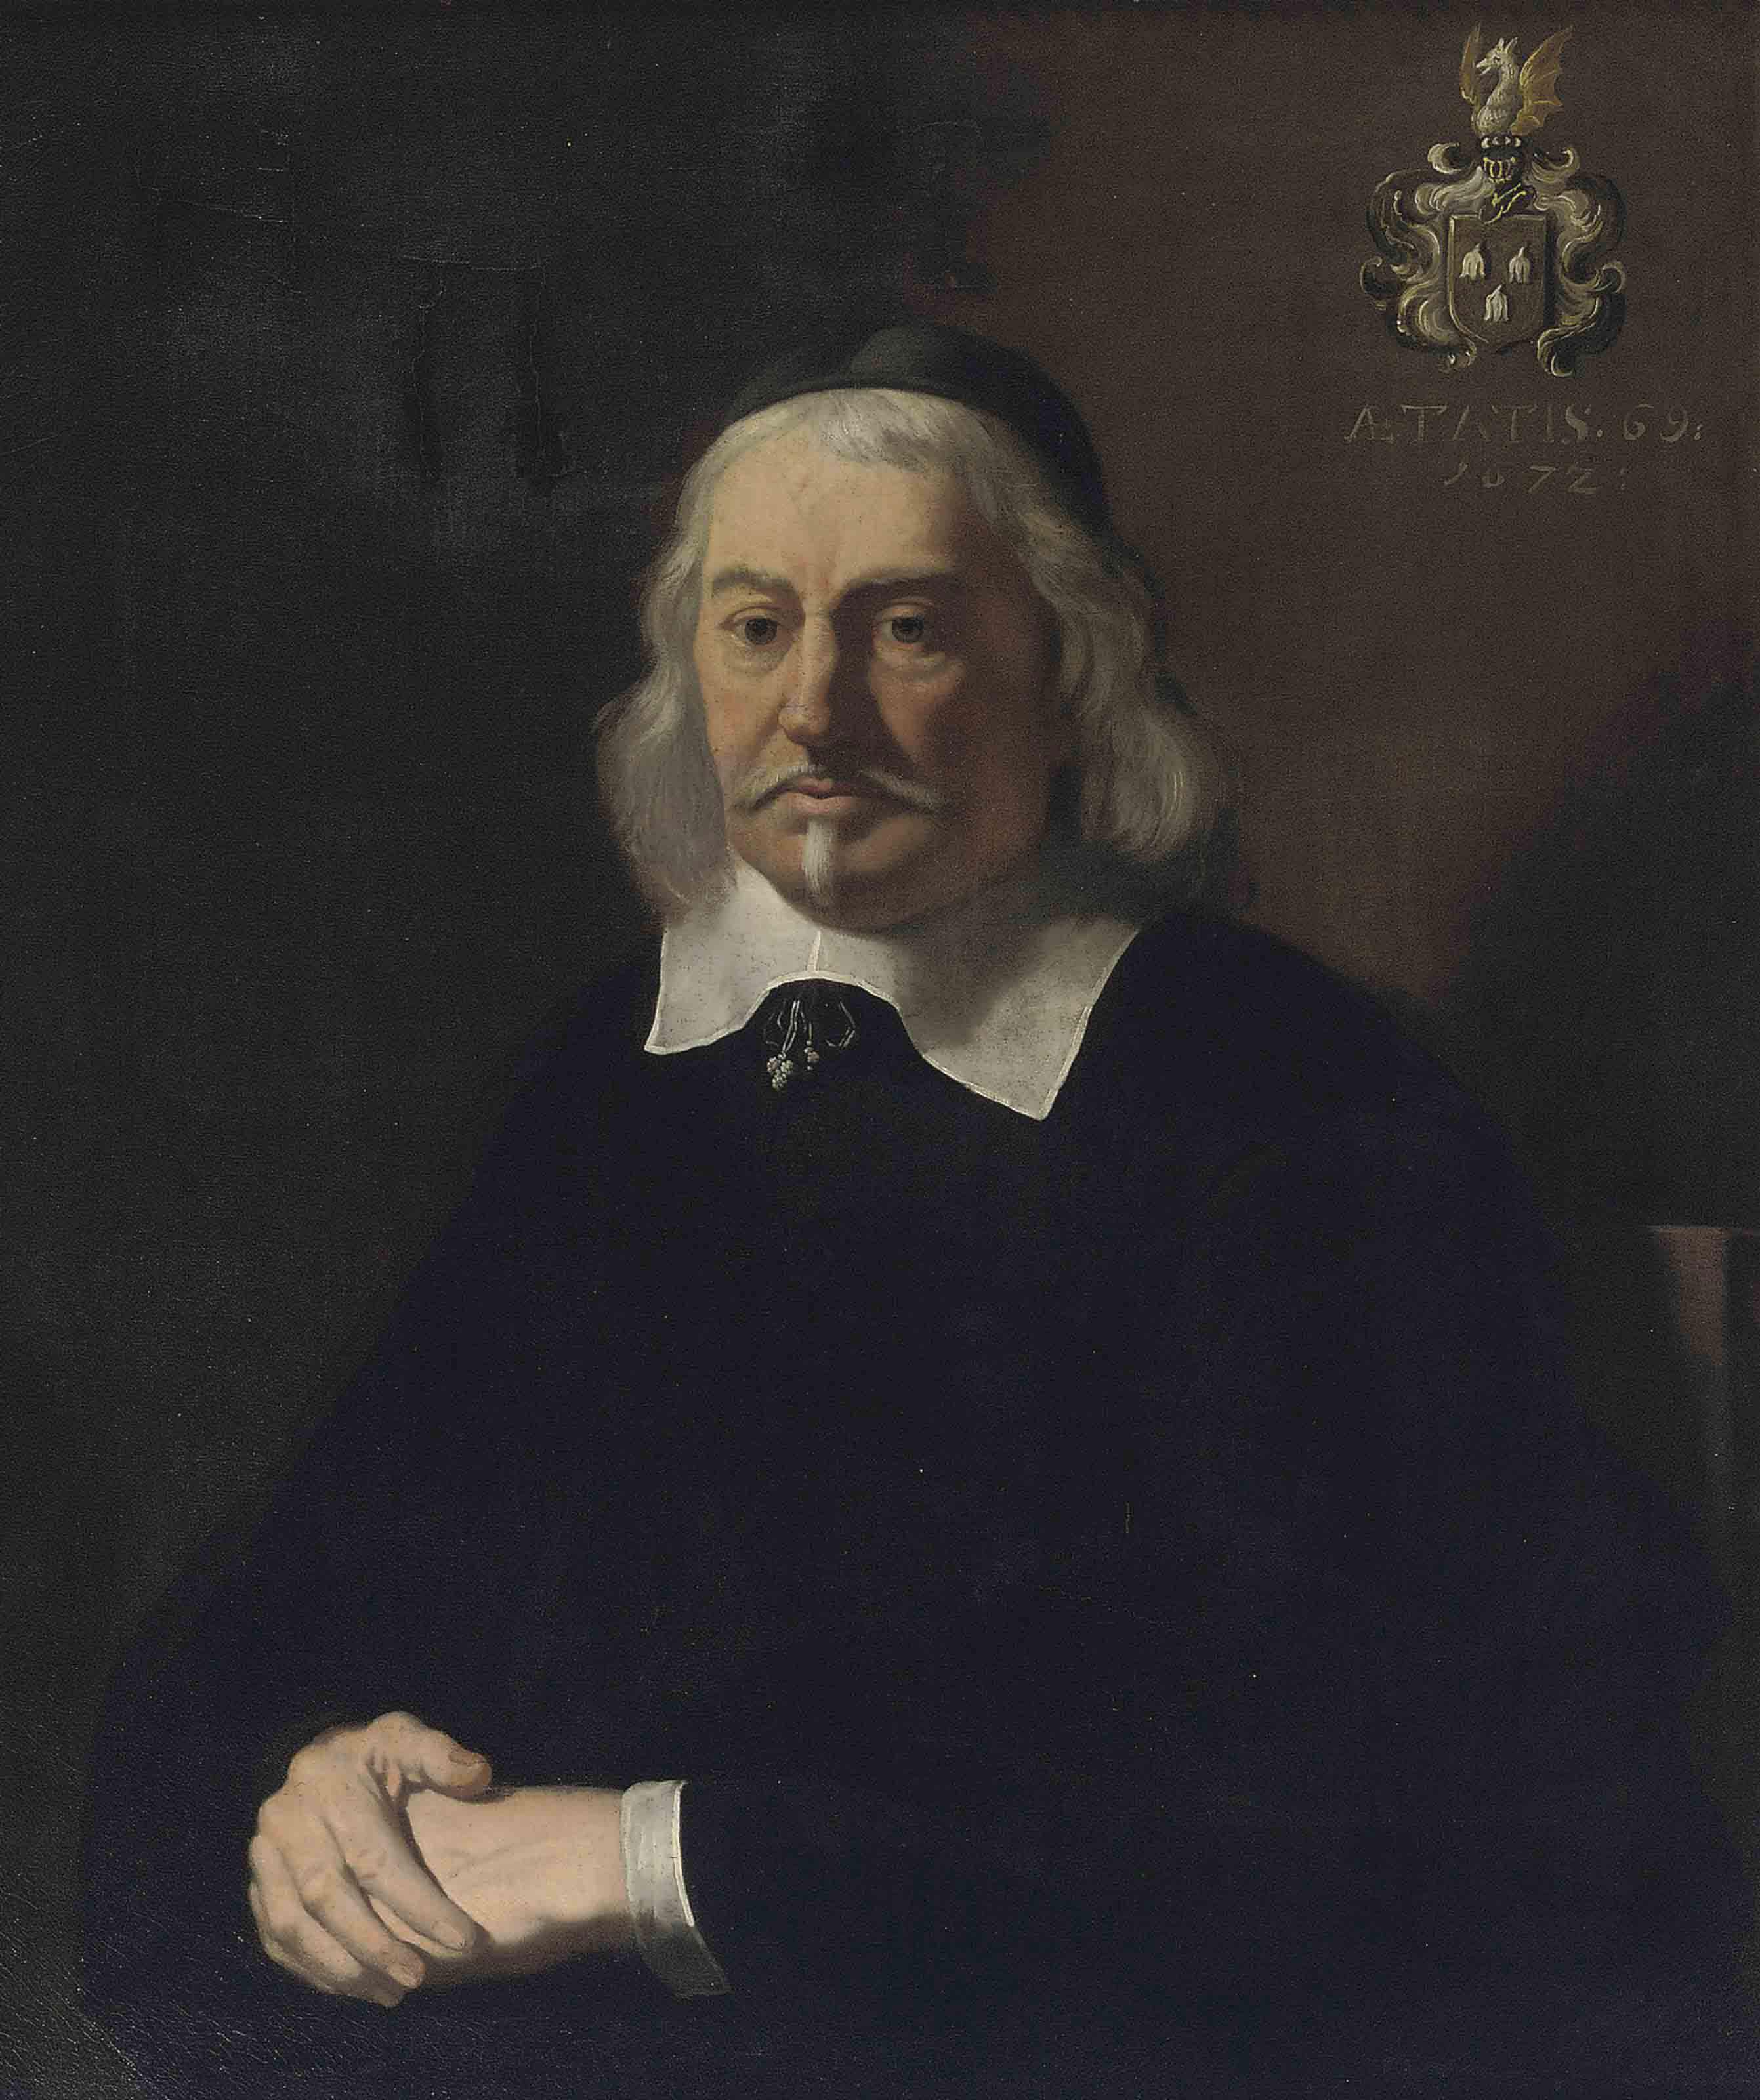 Portrait of Abraham Velters (1603-1690), half-length, wearing a skullcap